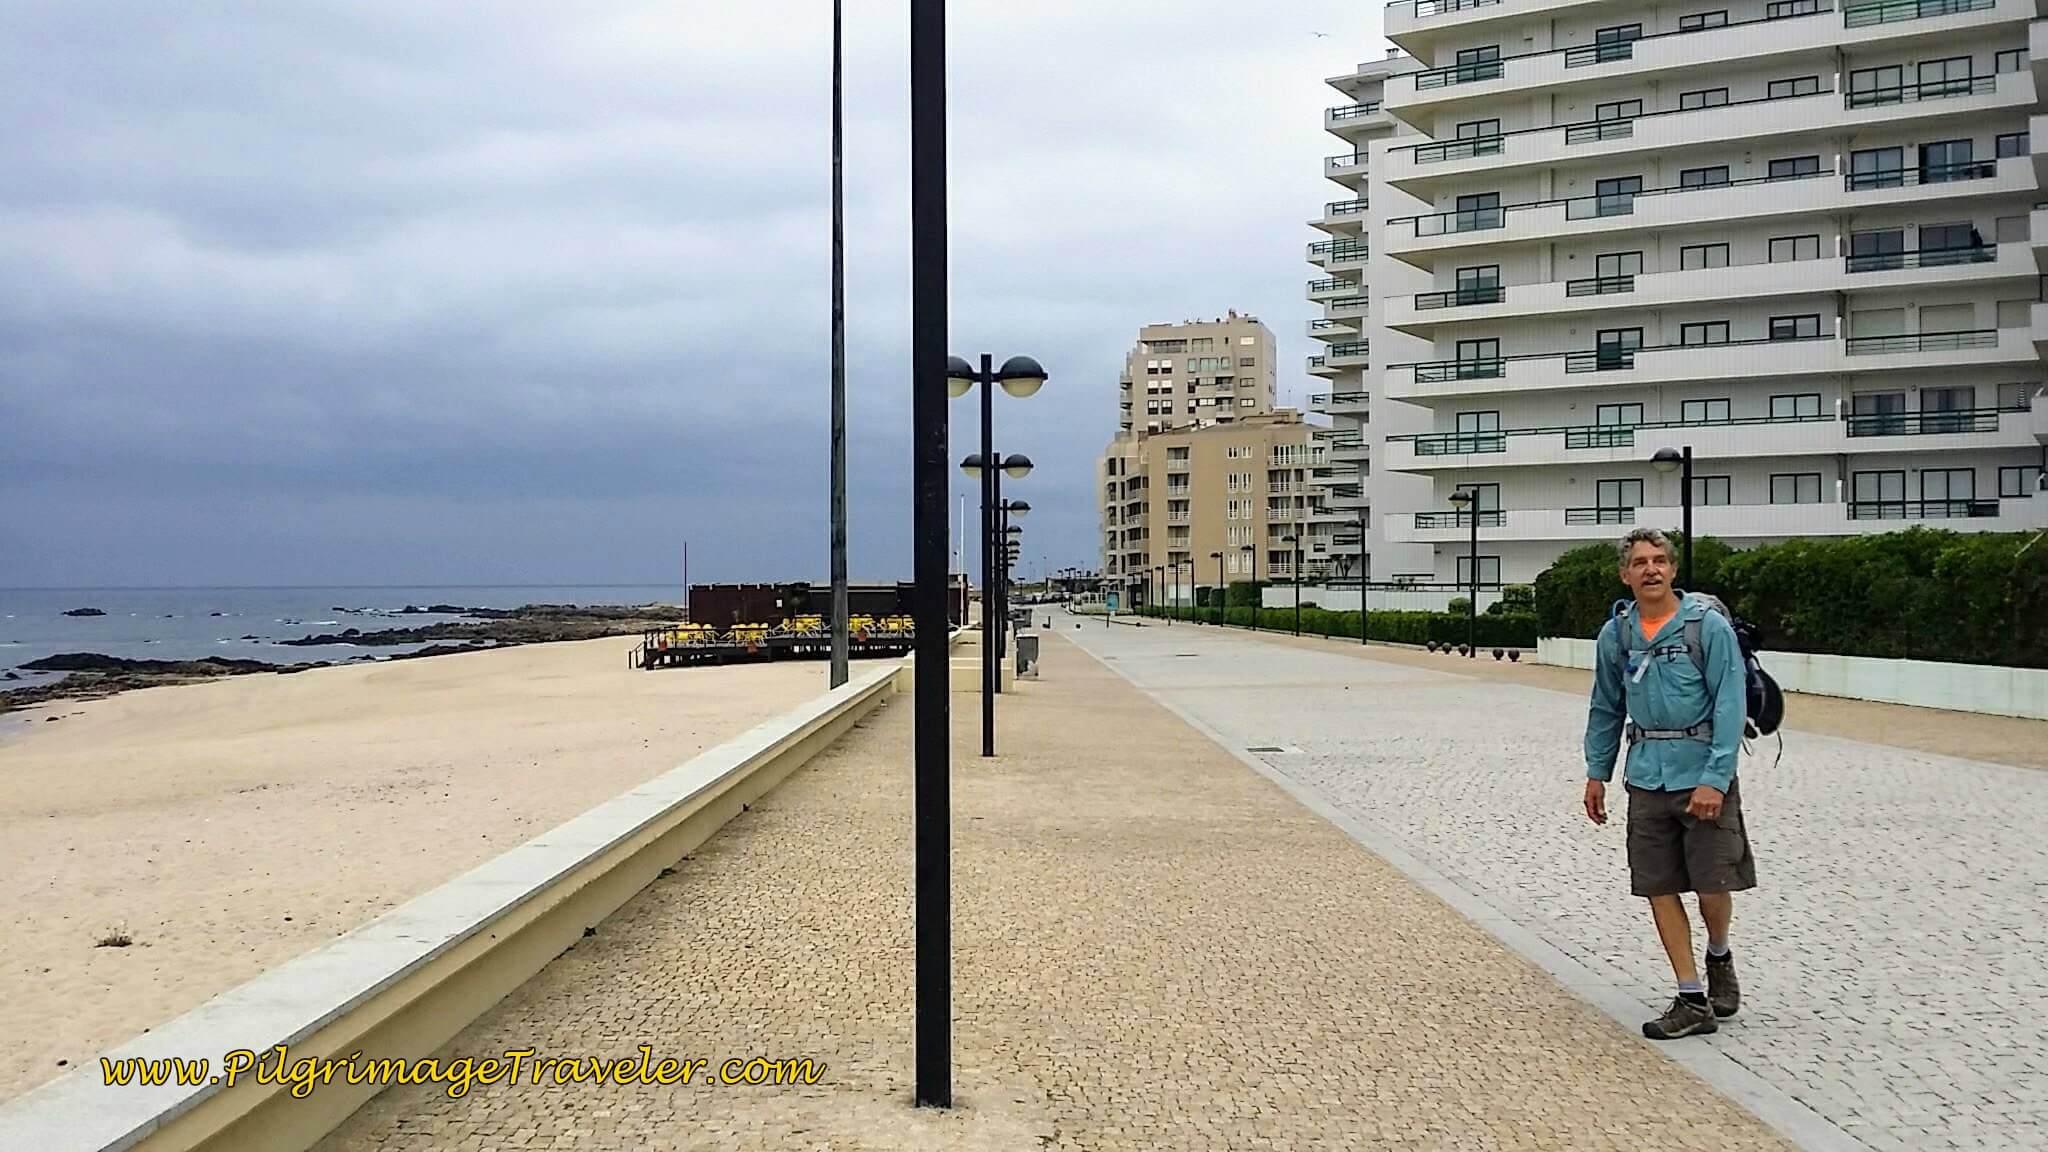 Rich on the Avenida dos Pescadores at the Praia Lagoa on day sixteen of the Camino Portugués on the Coastal Route